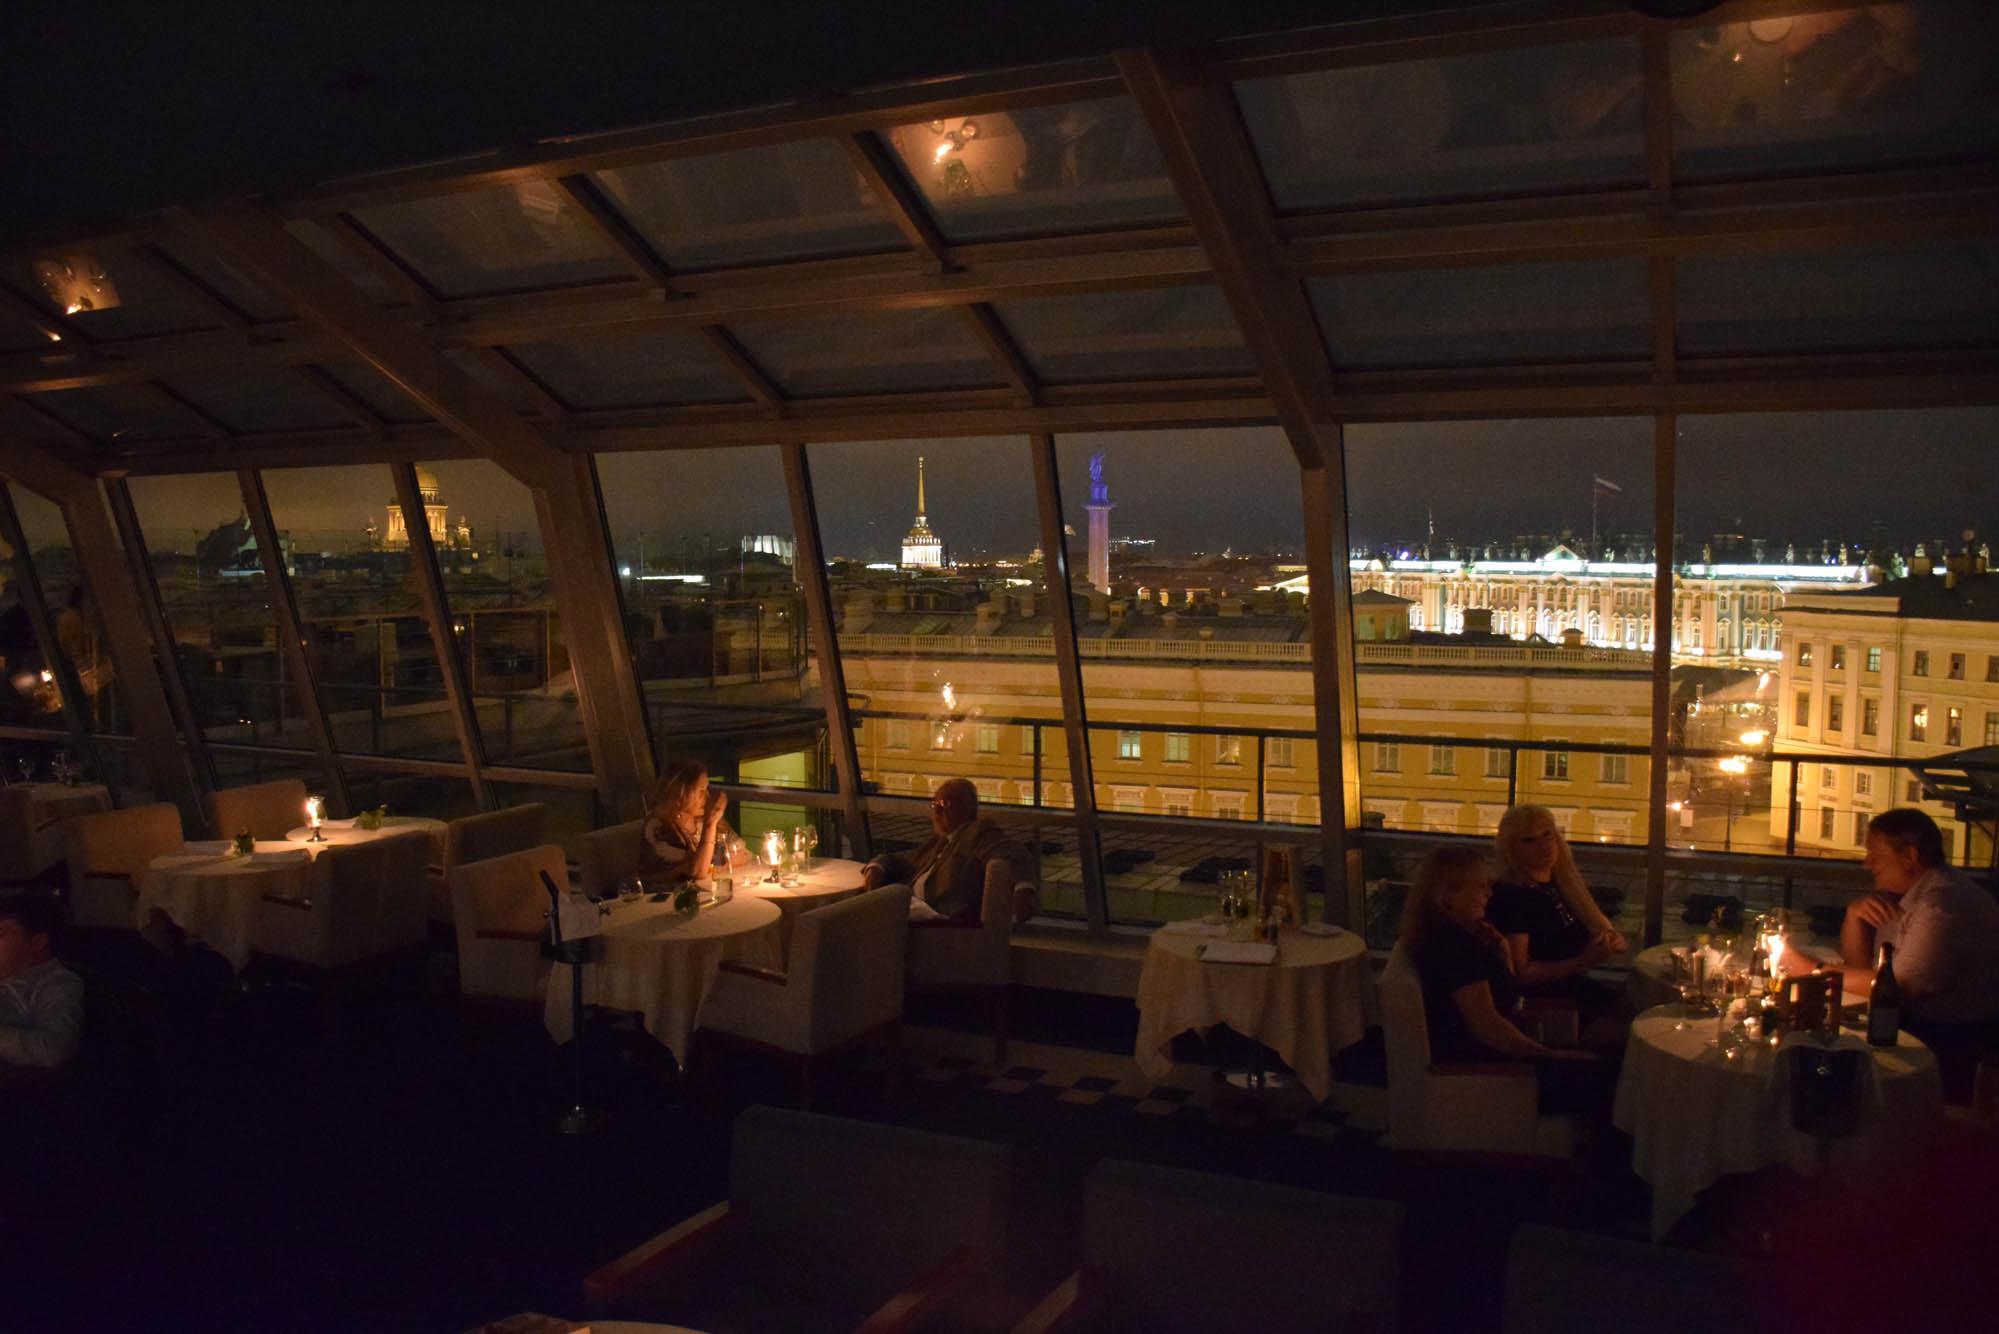 bellevue brasserie restaurant st petersburg kempinski moika 22 hotel russia 03